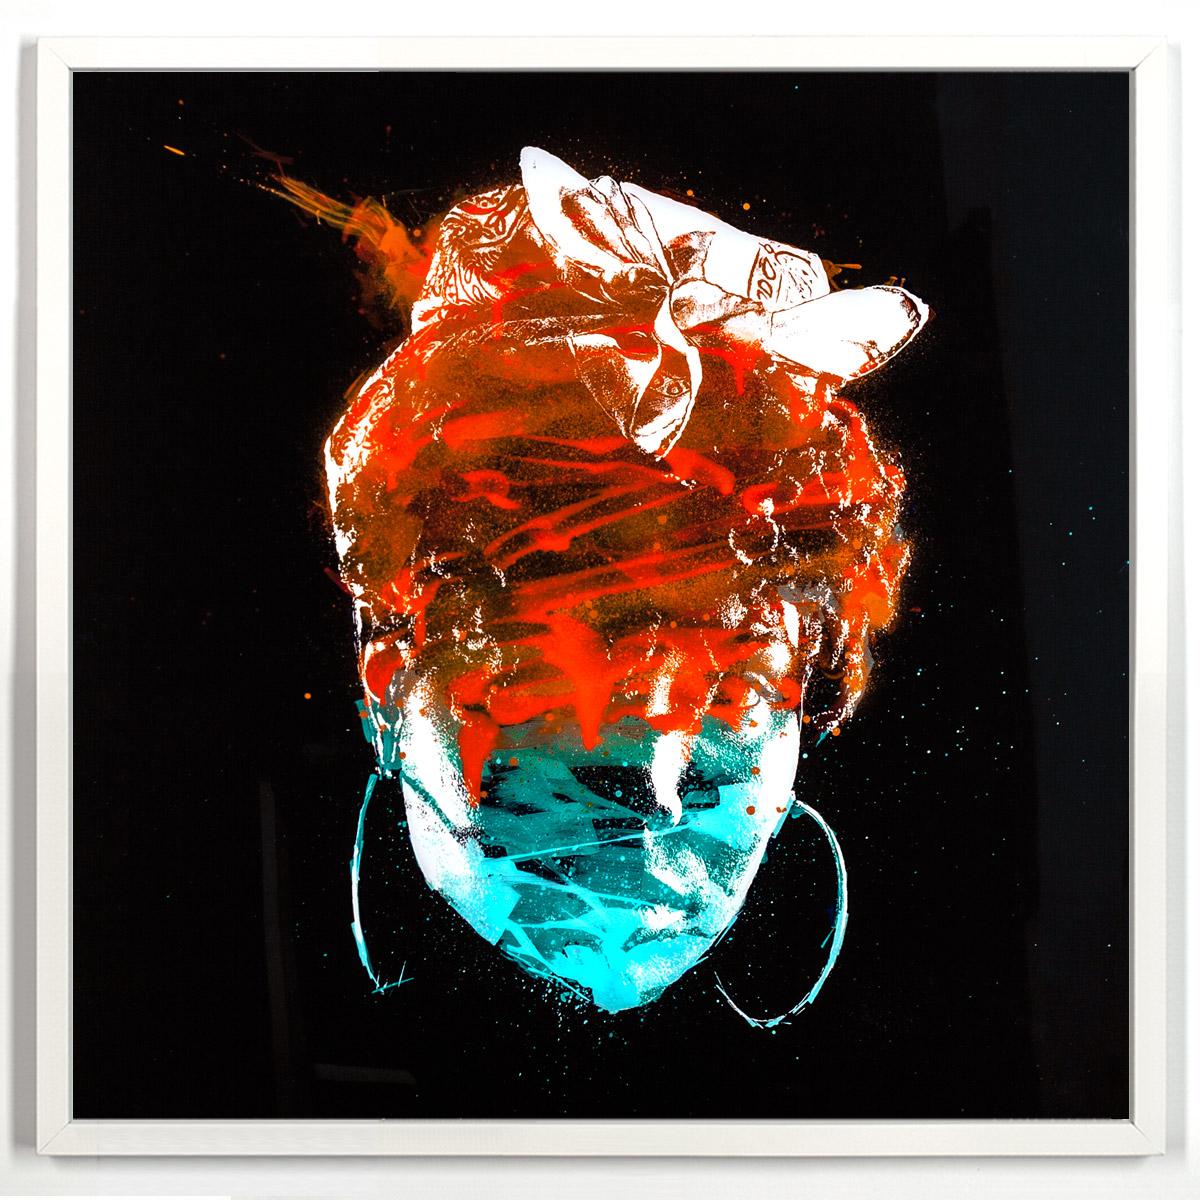 "Yolanda Entropy α  Enamel, Acrylic and Spray Paint on Plexiglass 52"" x 52"" $1,800 Includes a 1"" 1/2 White Wood Frame"